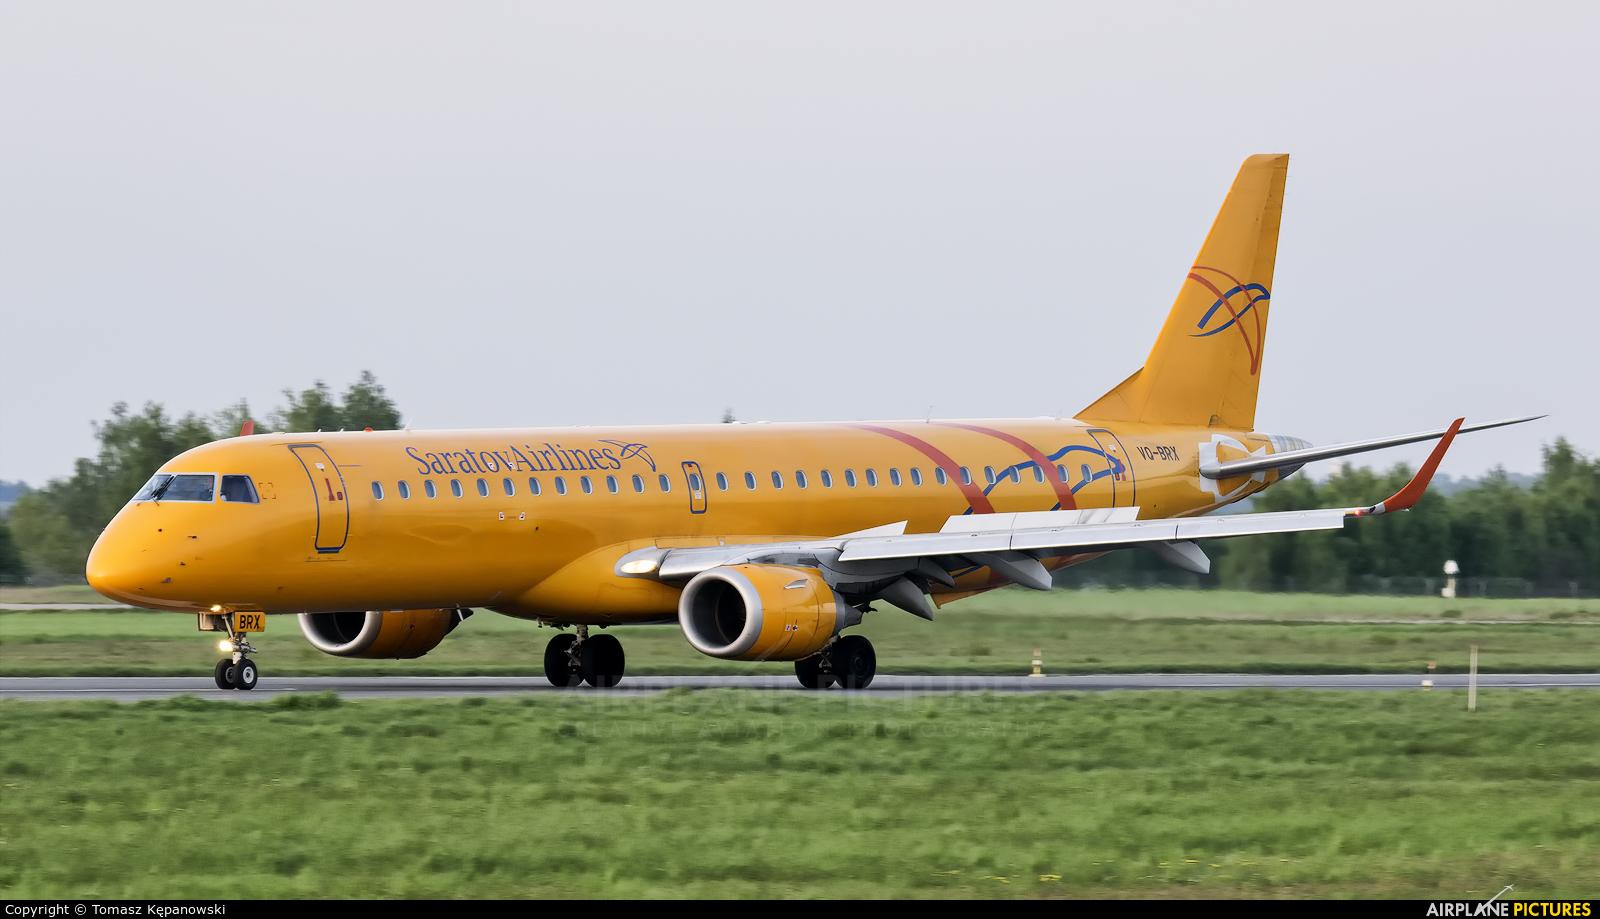 Saratov Airlines VQ-BRX aircraft at Rzeszów-Jasionka